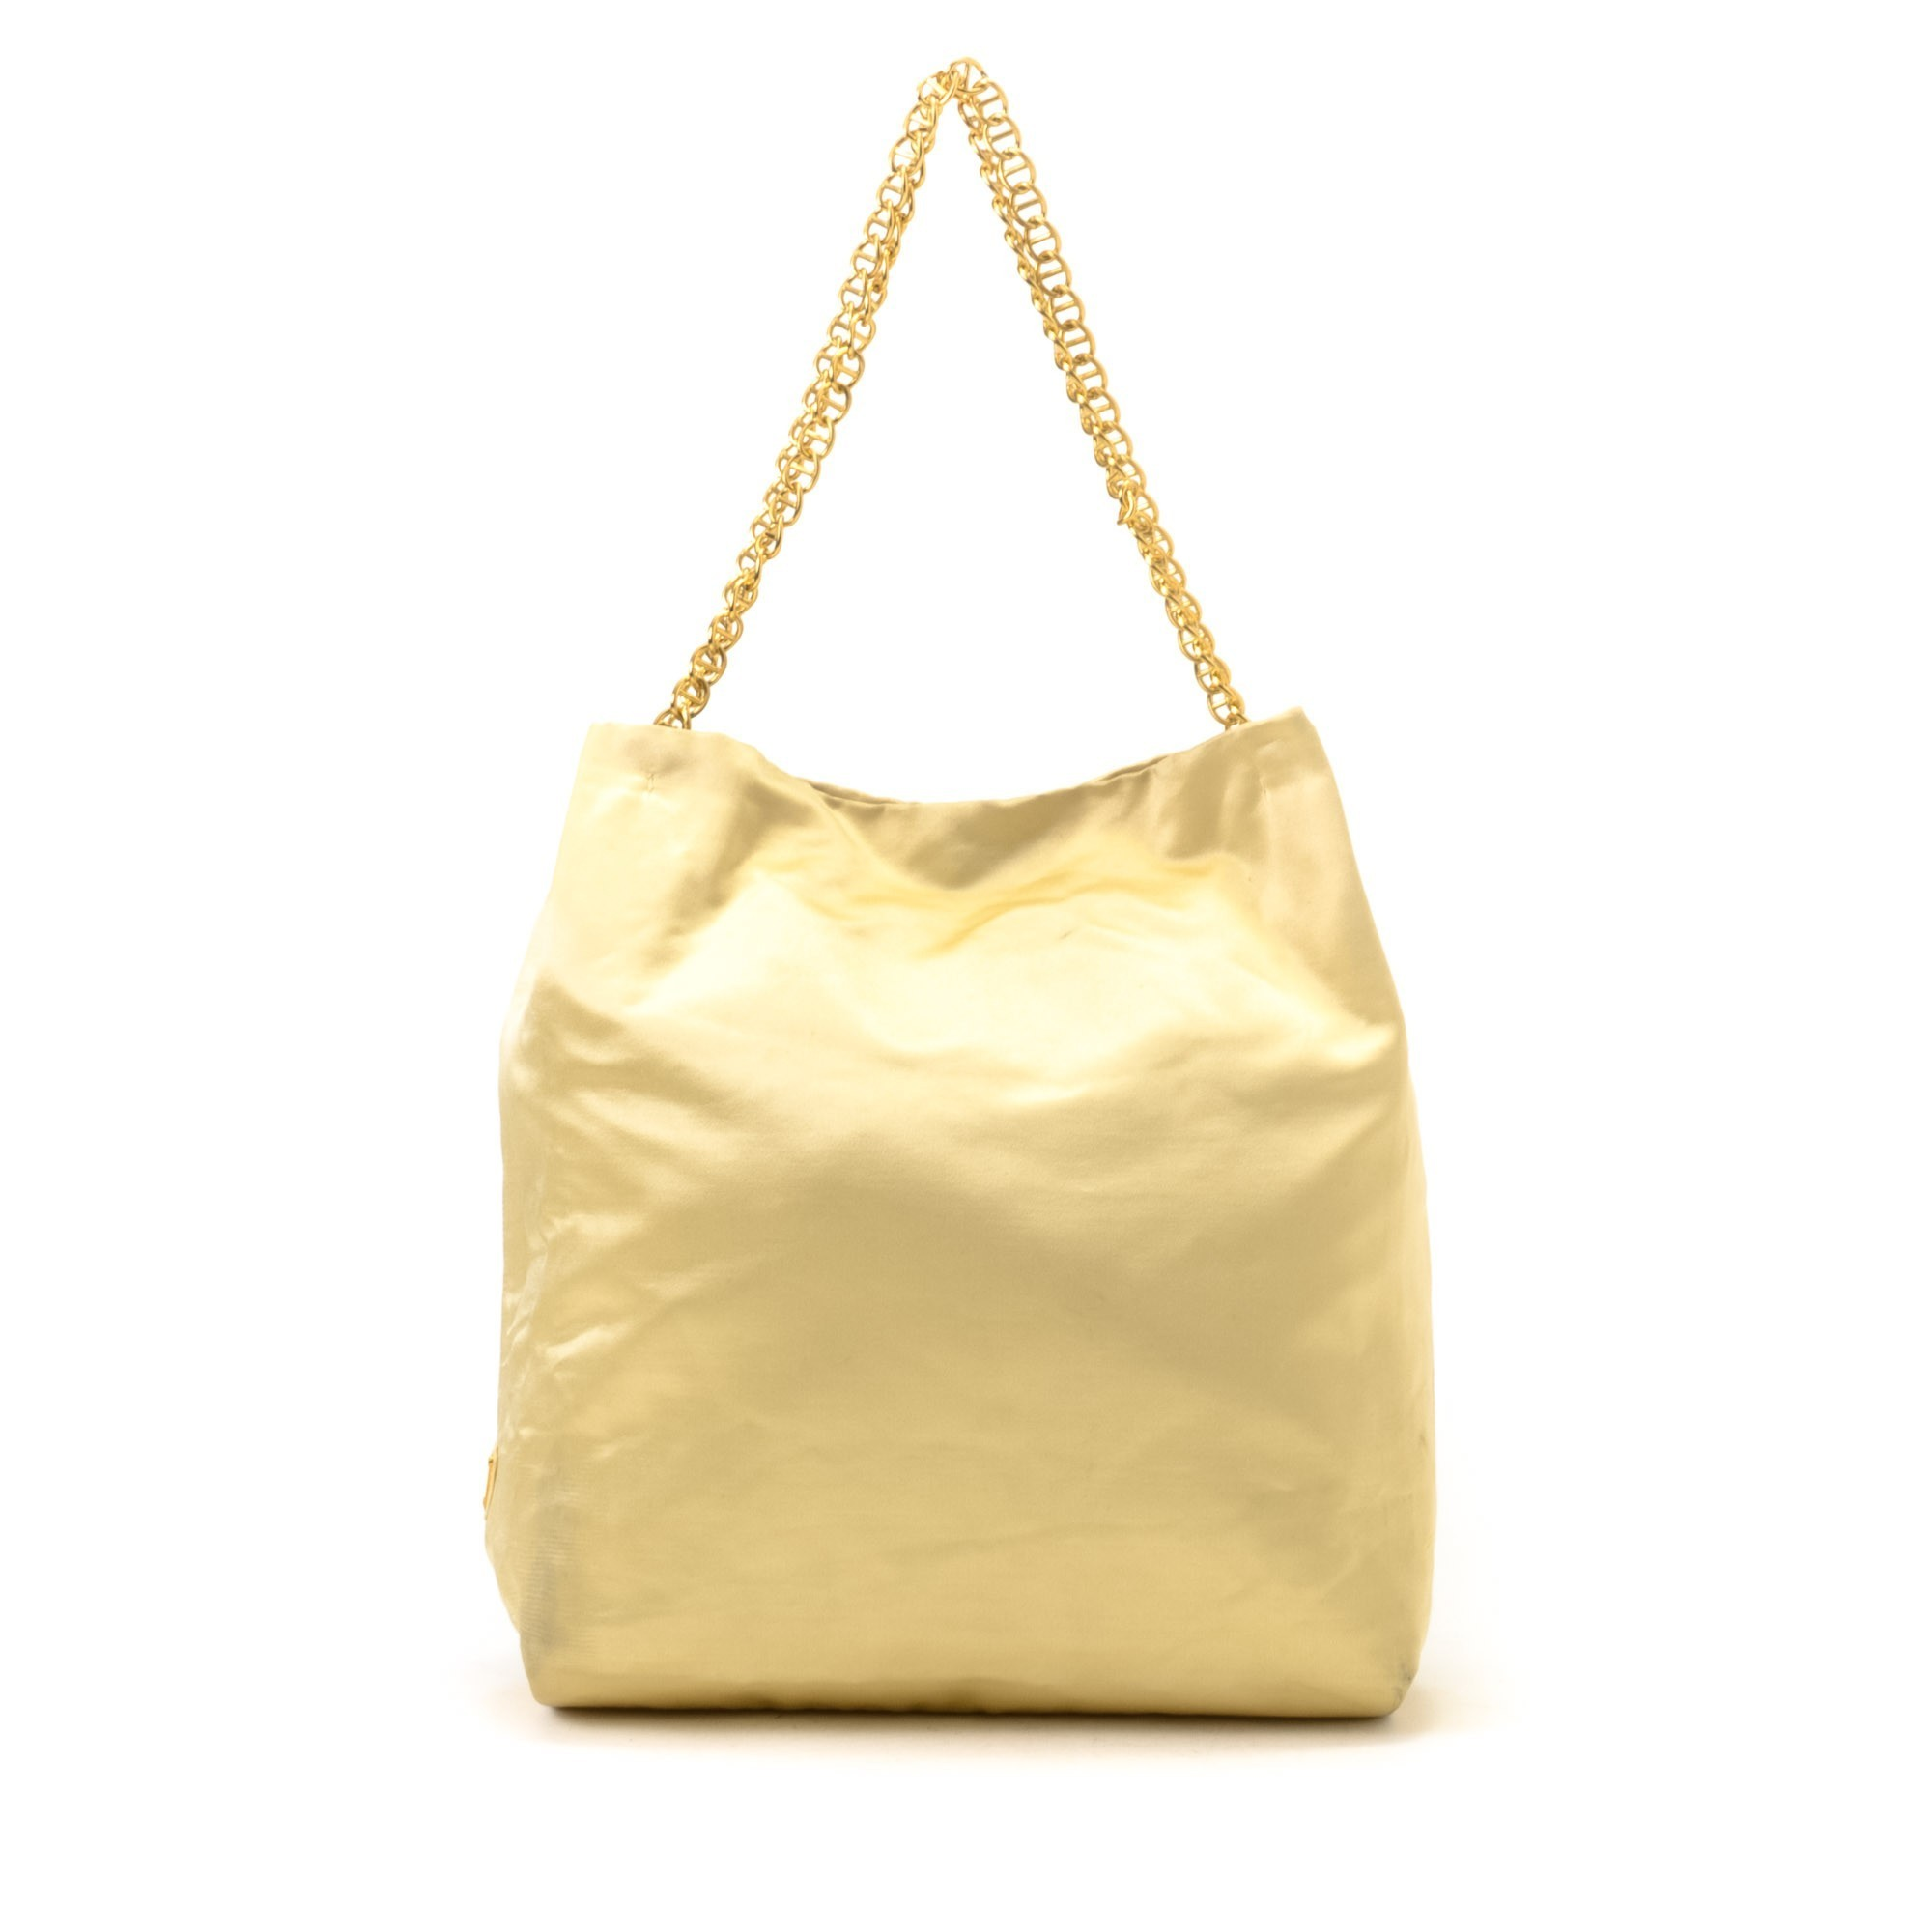 prada replica purse - Prada Chain Tote Yellow Satin Tote - LXR&CO Vintage Luxury